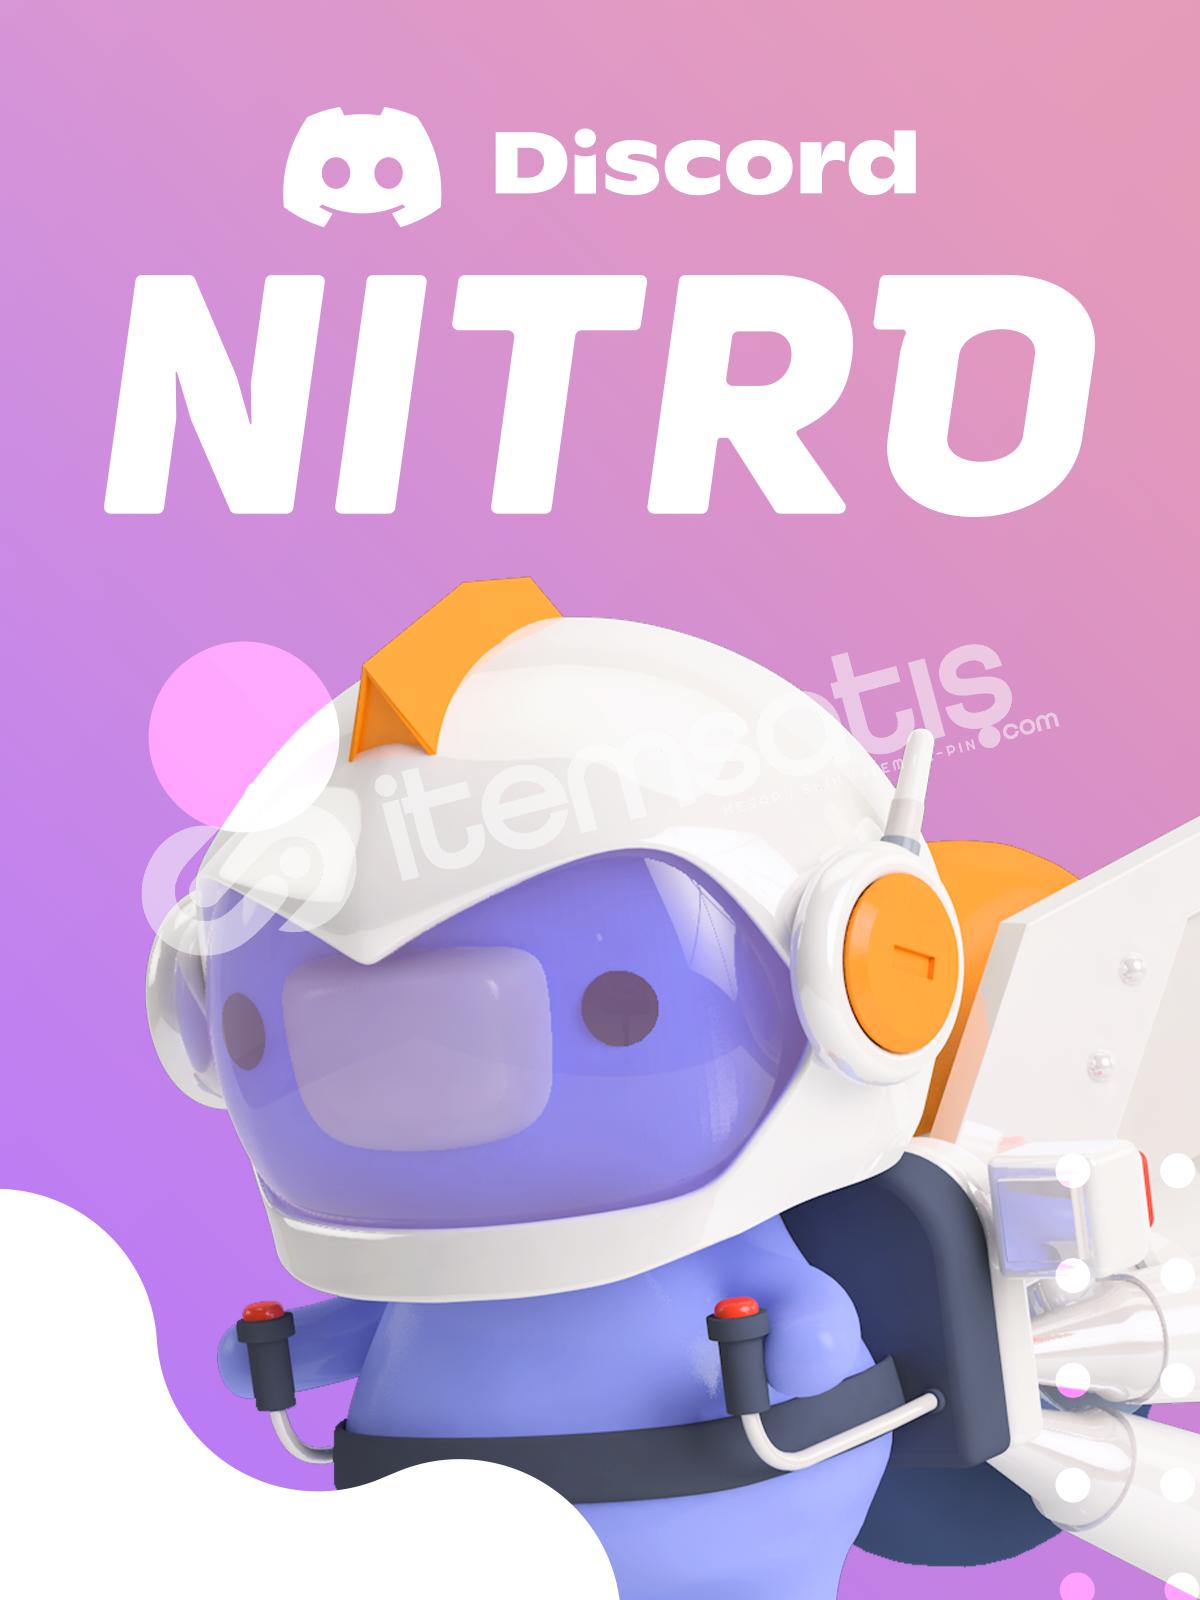 Discord 3 Aylık Boostlu Nitro ( EN UCUZU BURADA )